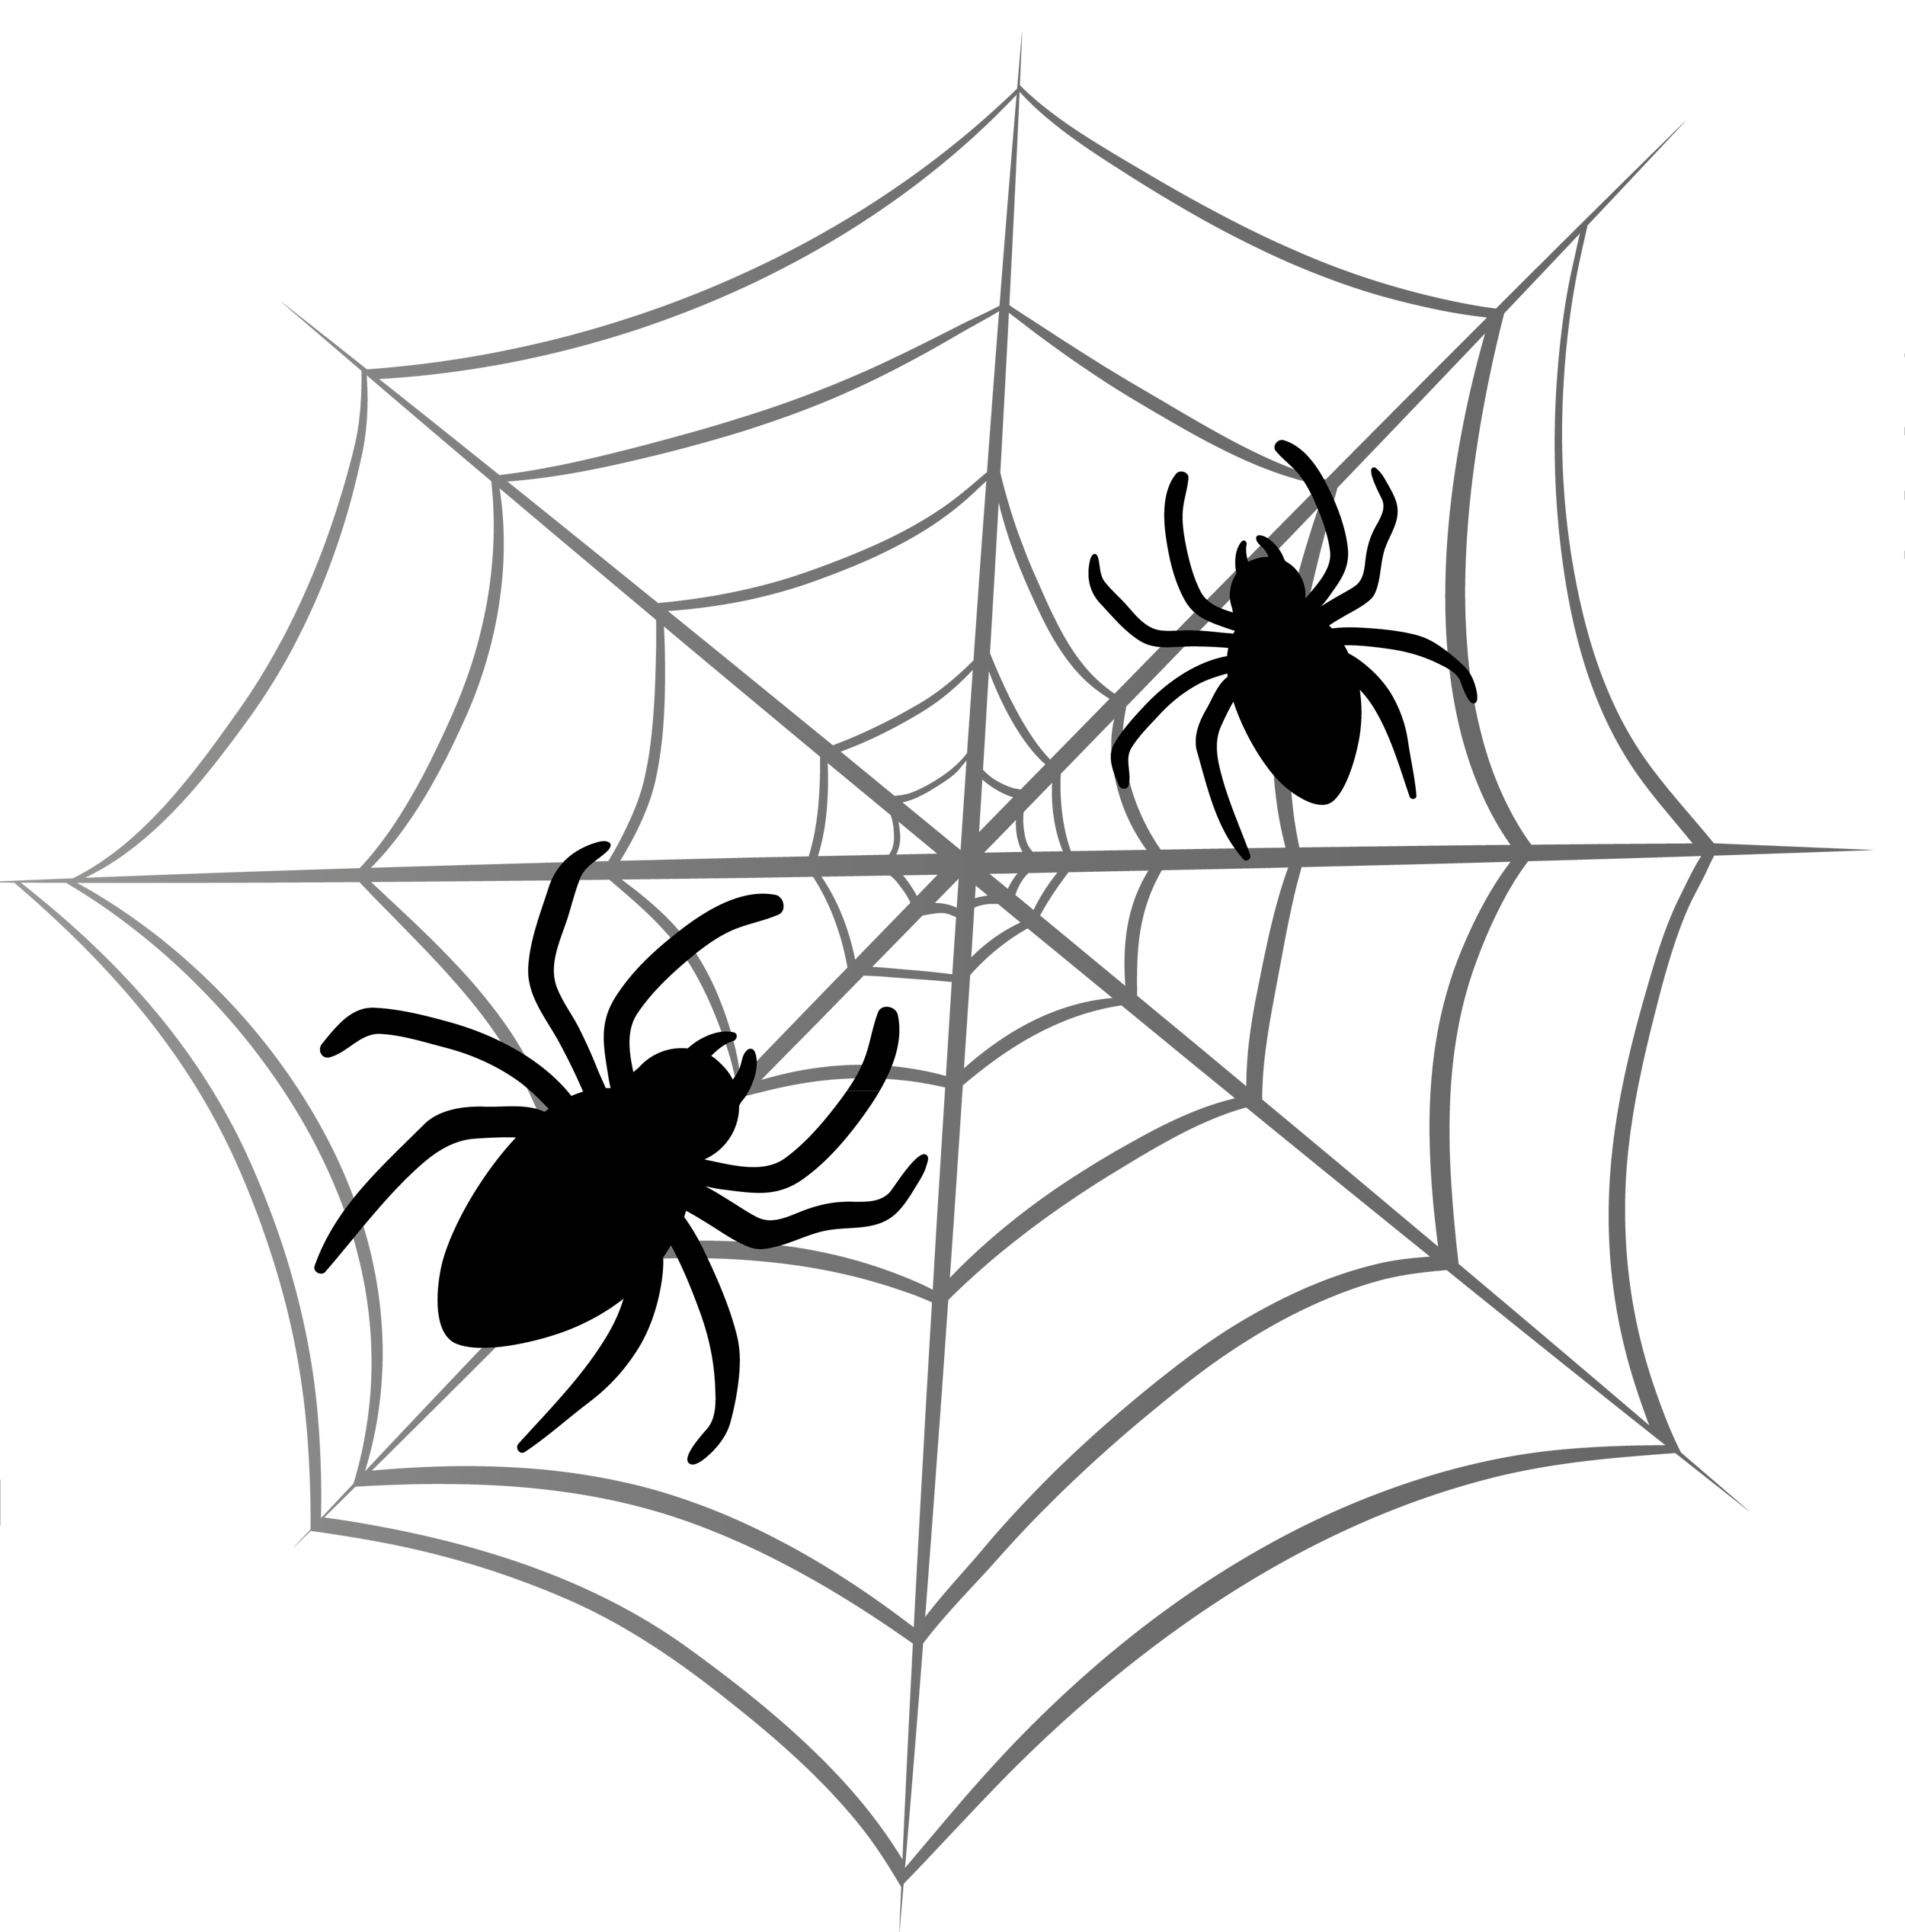 2500x2535 Spiderweb Vector Illustration Stock Vector Spider Web Spider